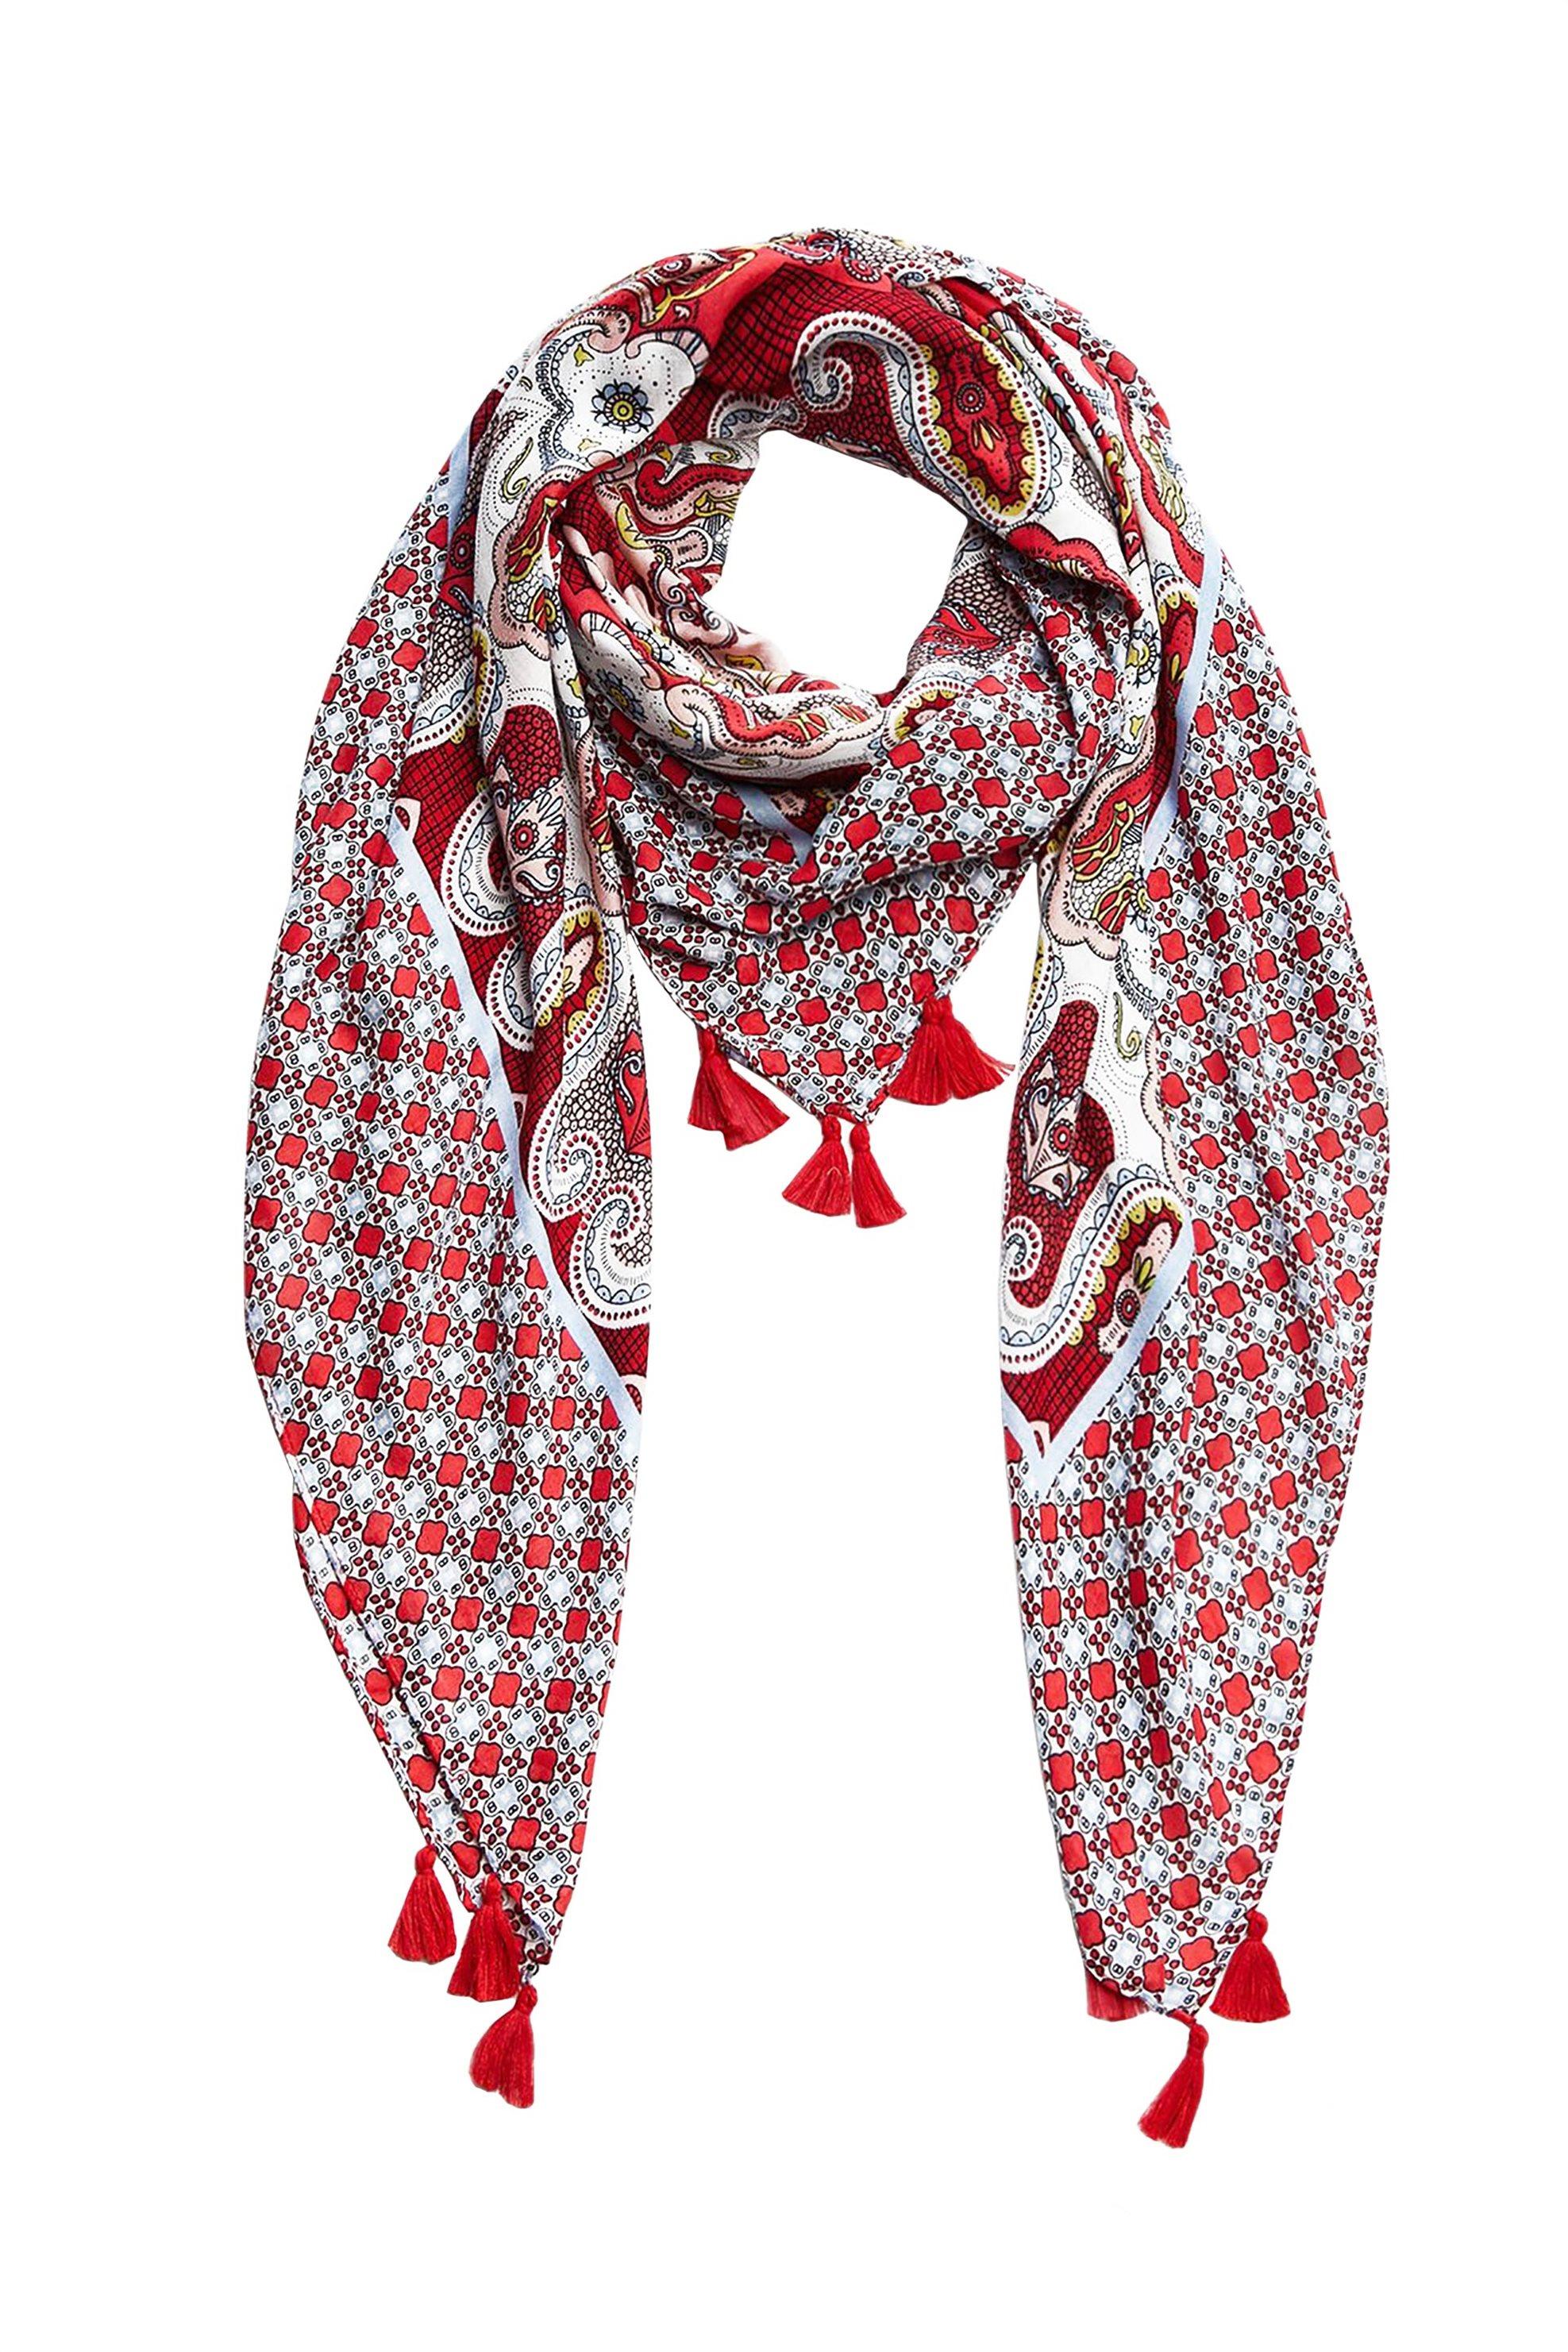 PIECES γυναικείo φουλάρι με λαχούρια και φόυντες - 17095929 - Κόκκινο γυναικα   αξεσουαρ   κασκόλ   μαντήλια